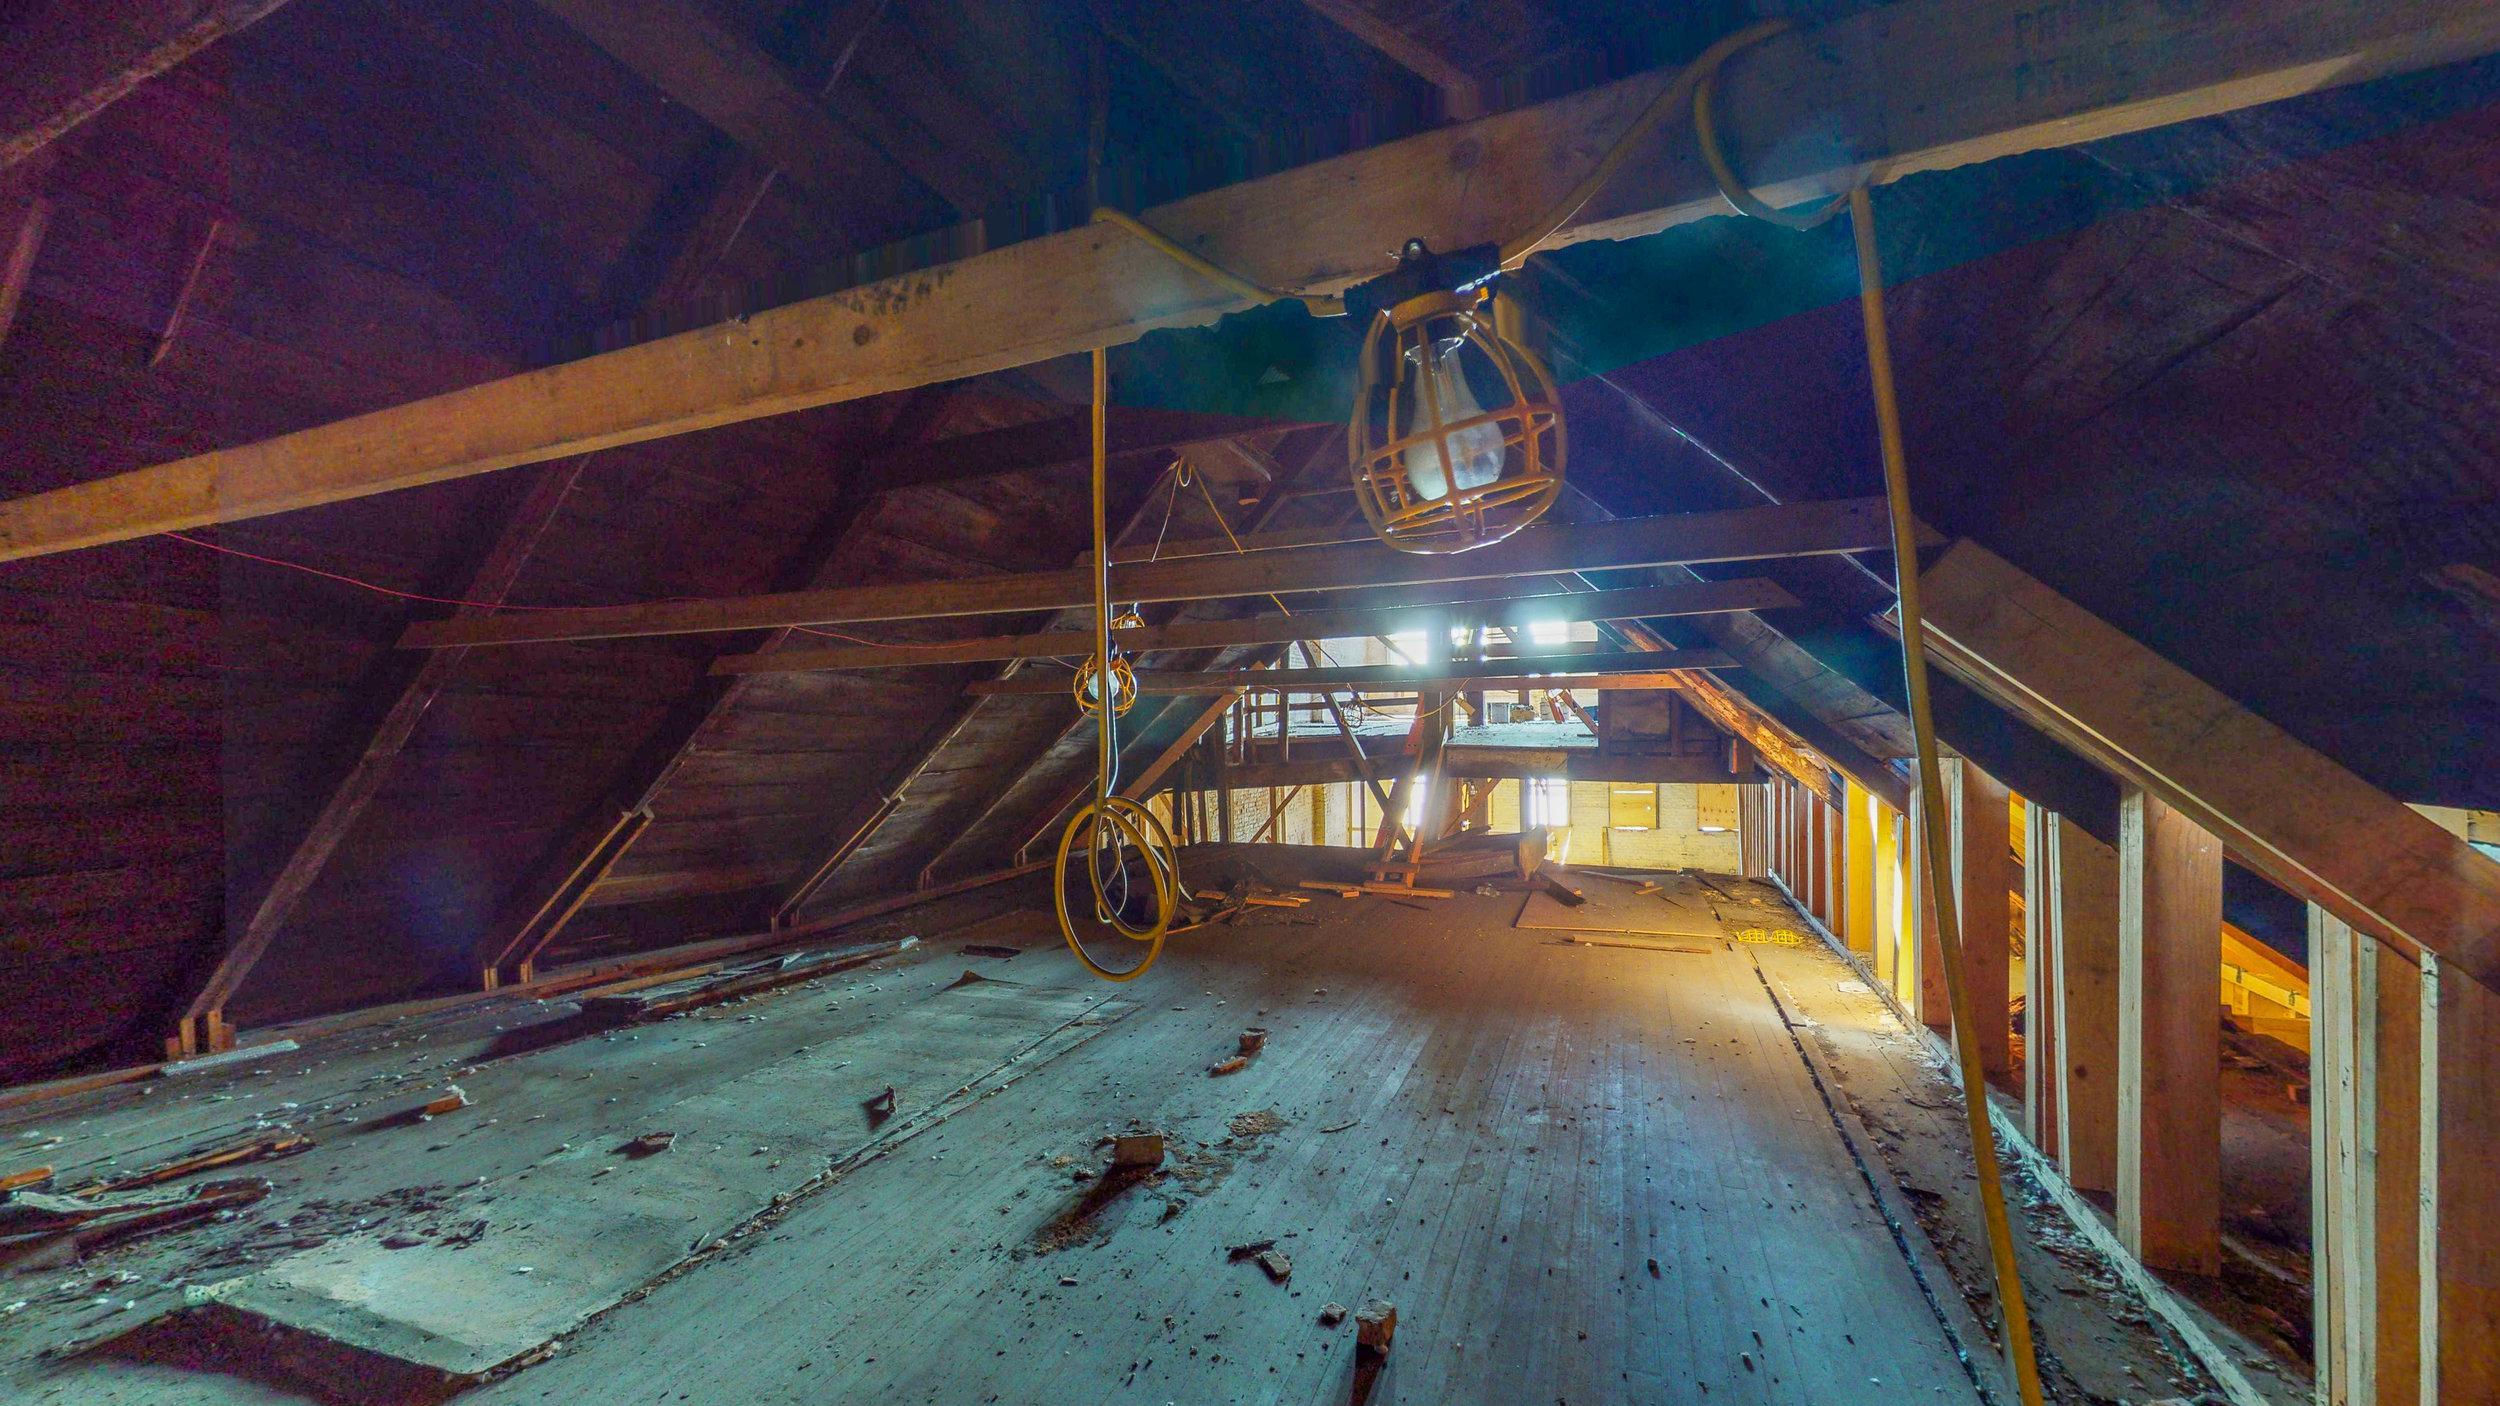 The-Van-Ostrande-Radliff-House-at-48-Hudson-08292019_123702.jpg